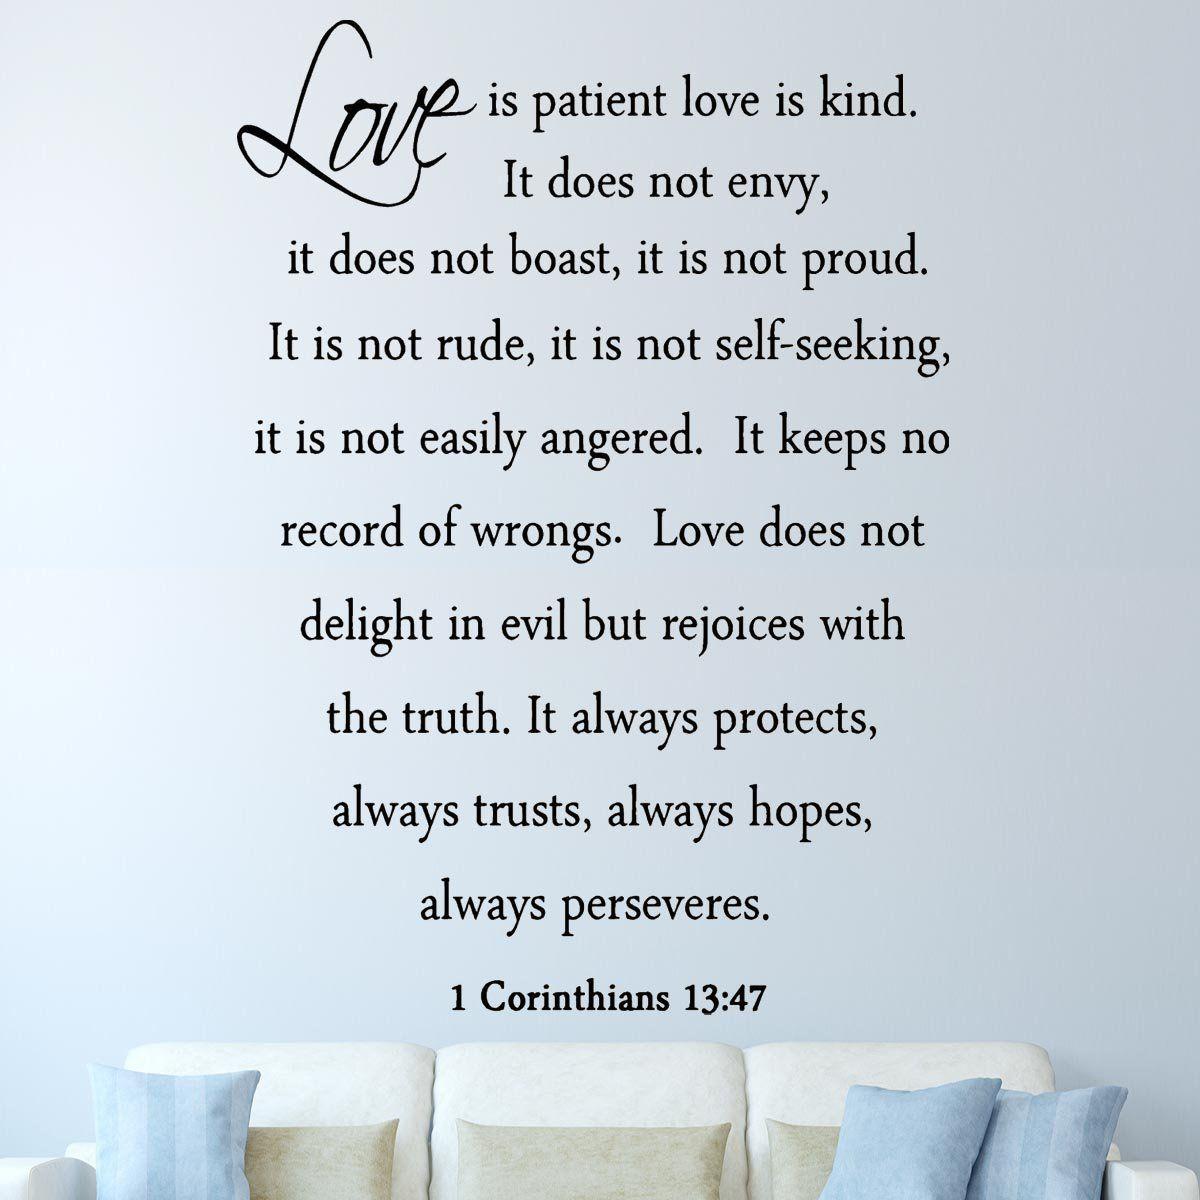 Vwaq Love Is Patient Love Is Kind 1 Corinthians 13 4 7 Vinyl Wall Decal Lip2 Version 2 Marriage Quotes From The Bible Love Is Patient Bible Wall Decals